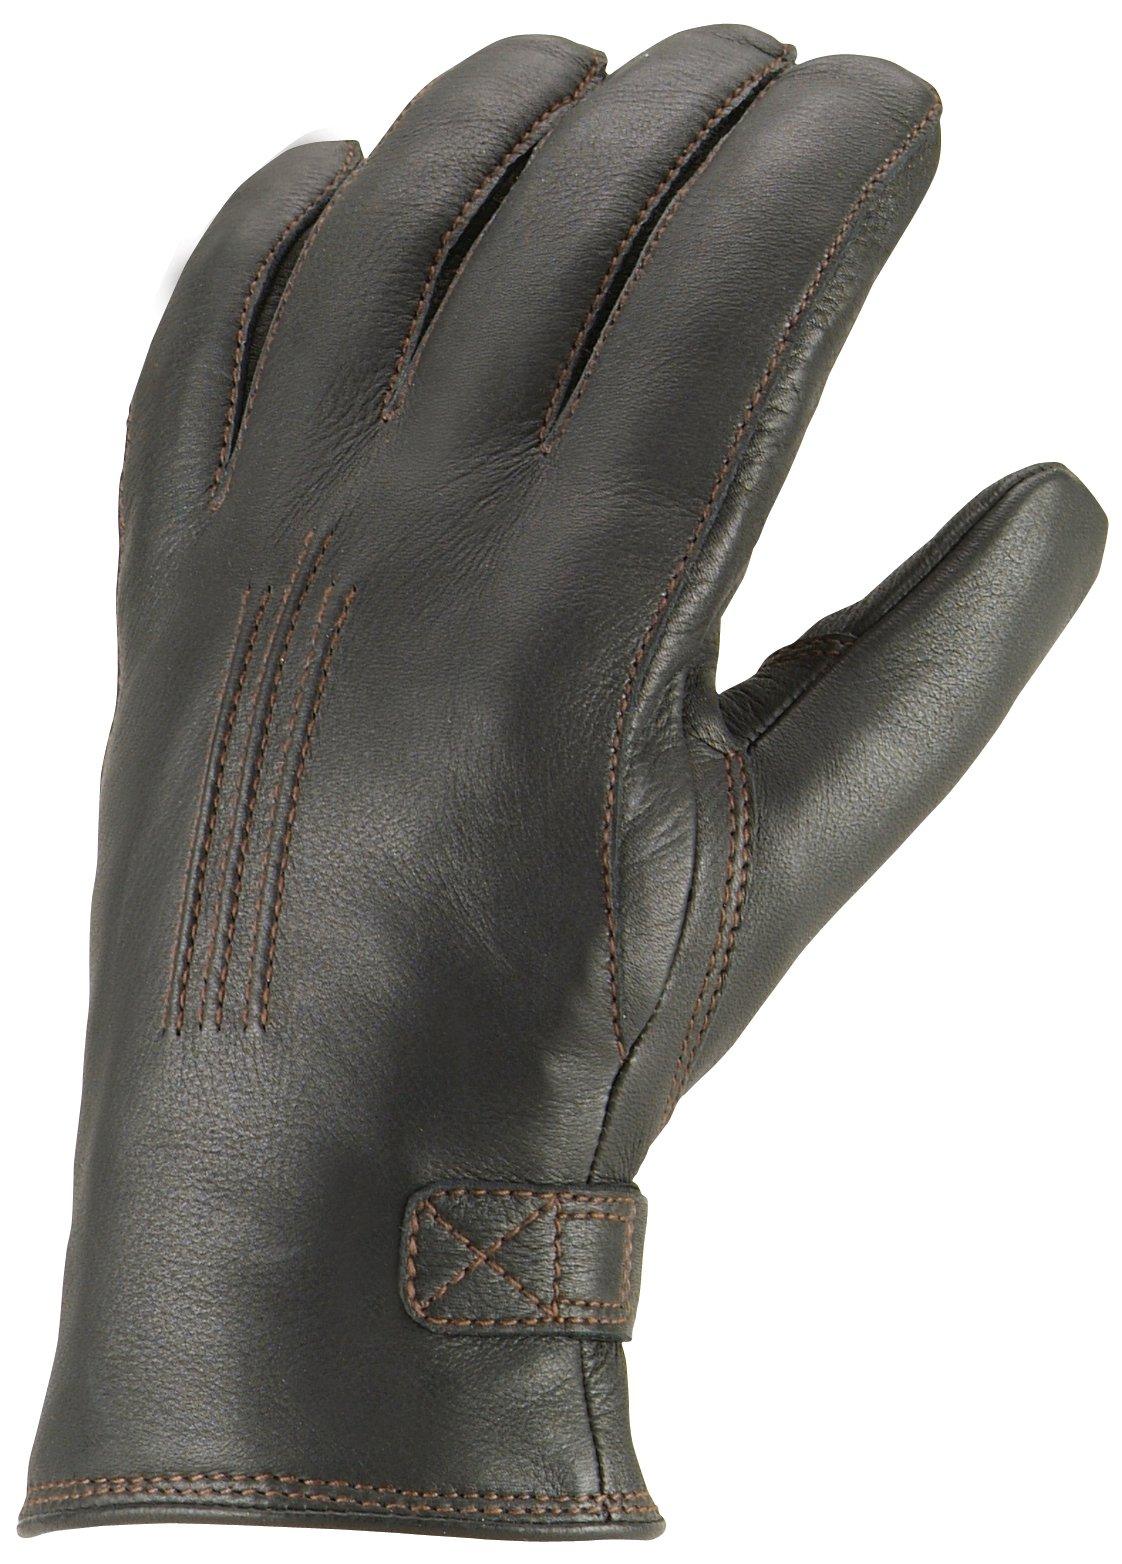 Hestra Men's Deerskin Lambsfur Lined Leather Gloves by Hestra